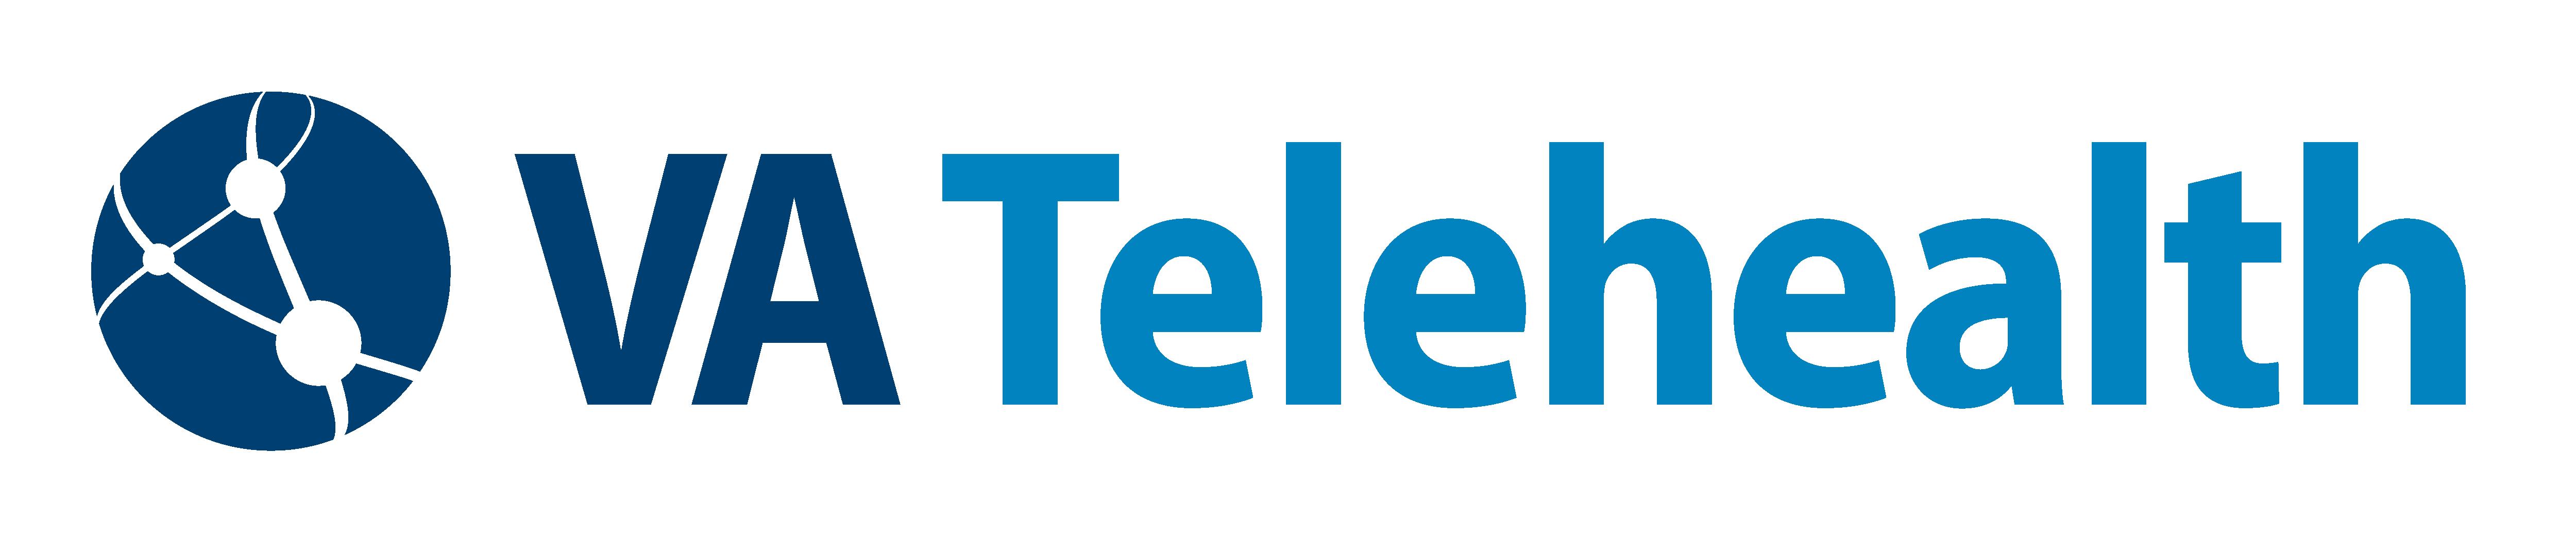 VA Telehealth Logo